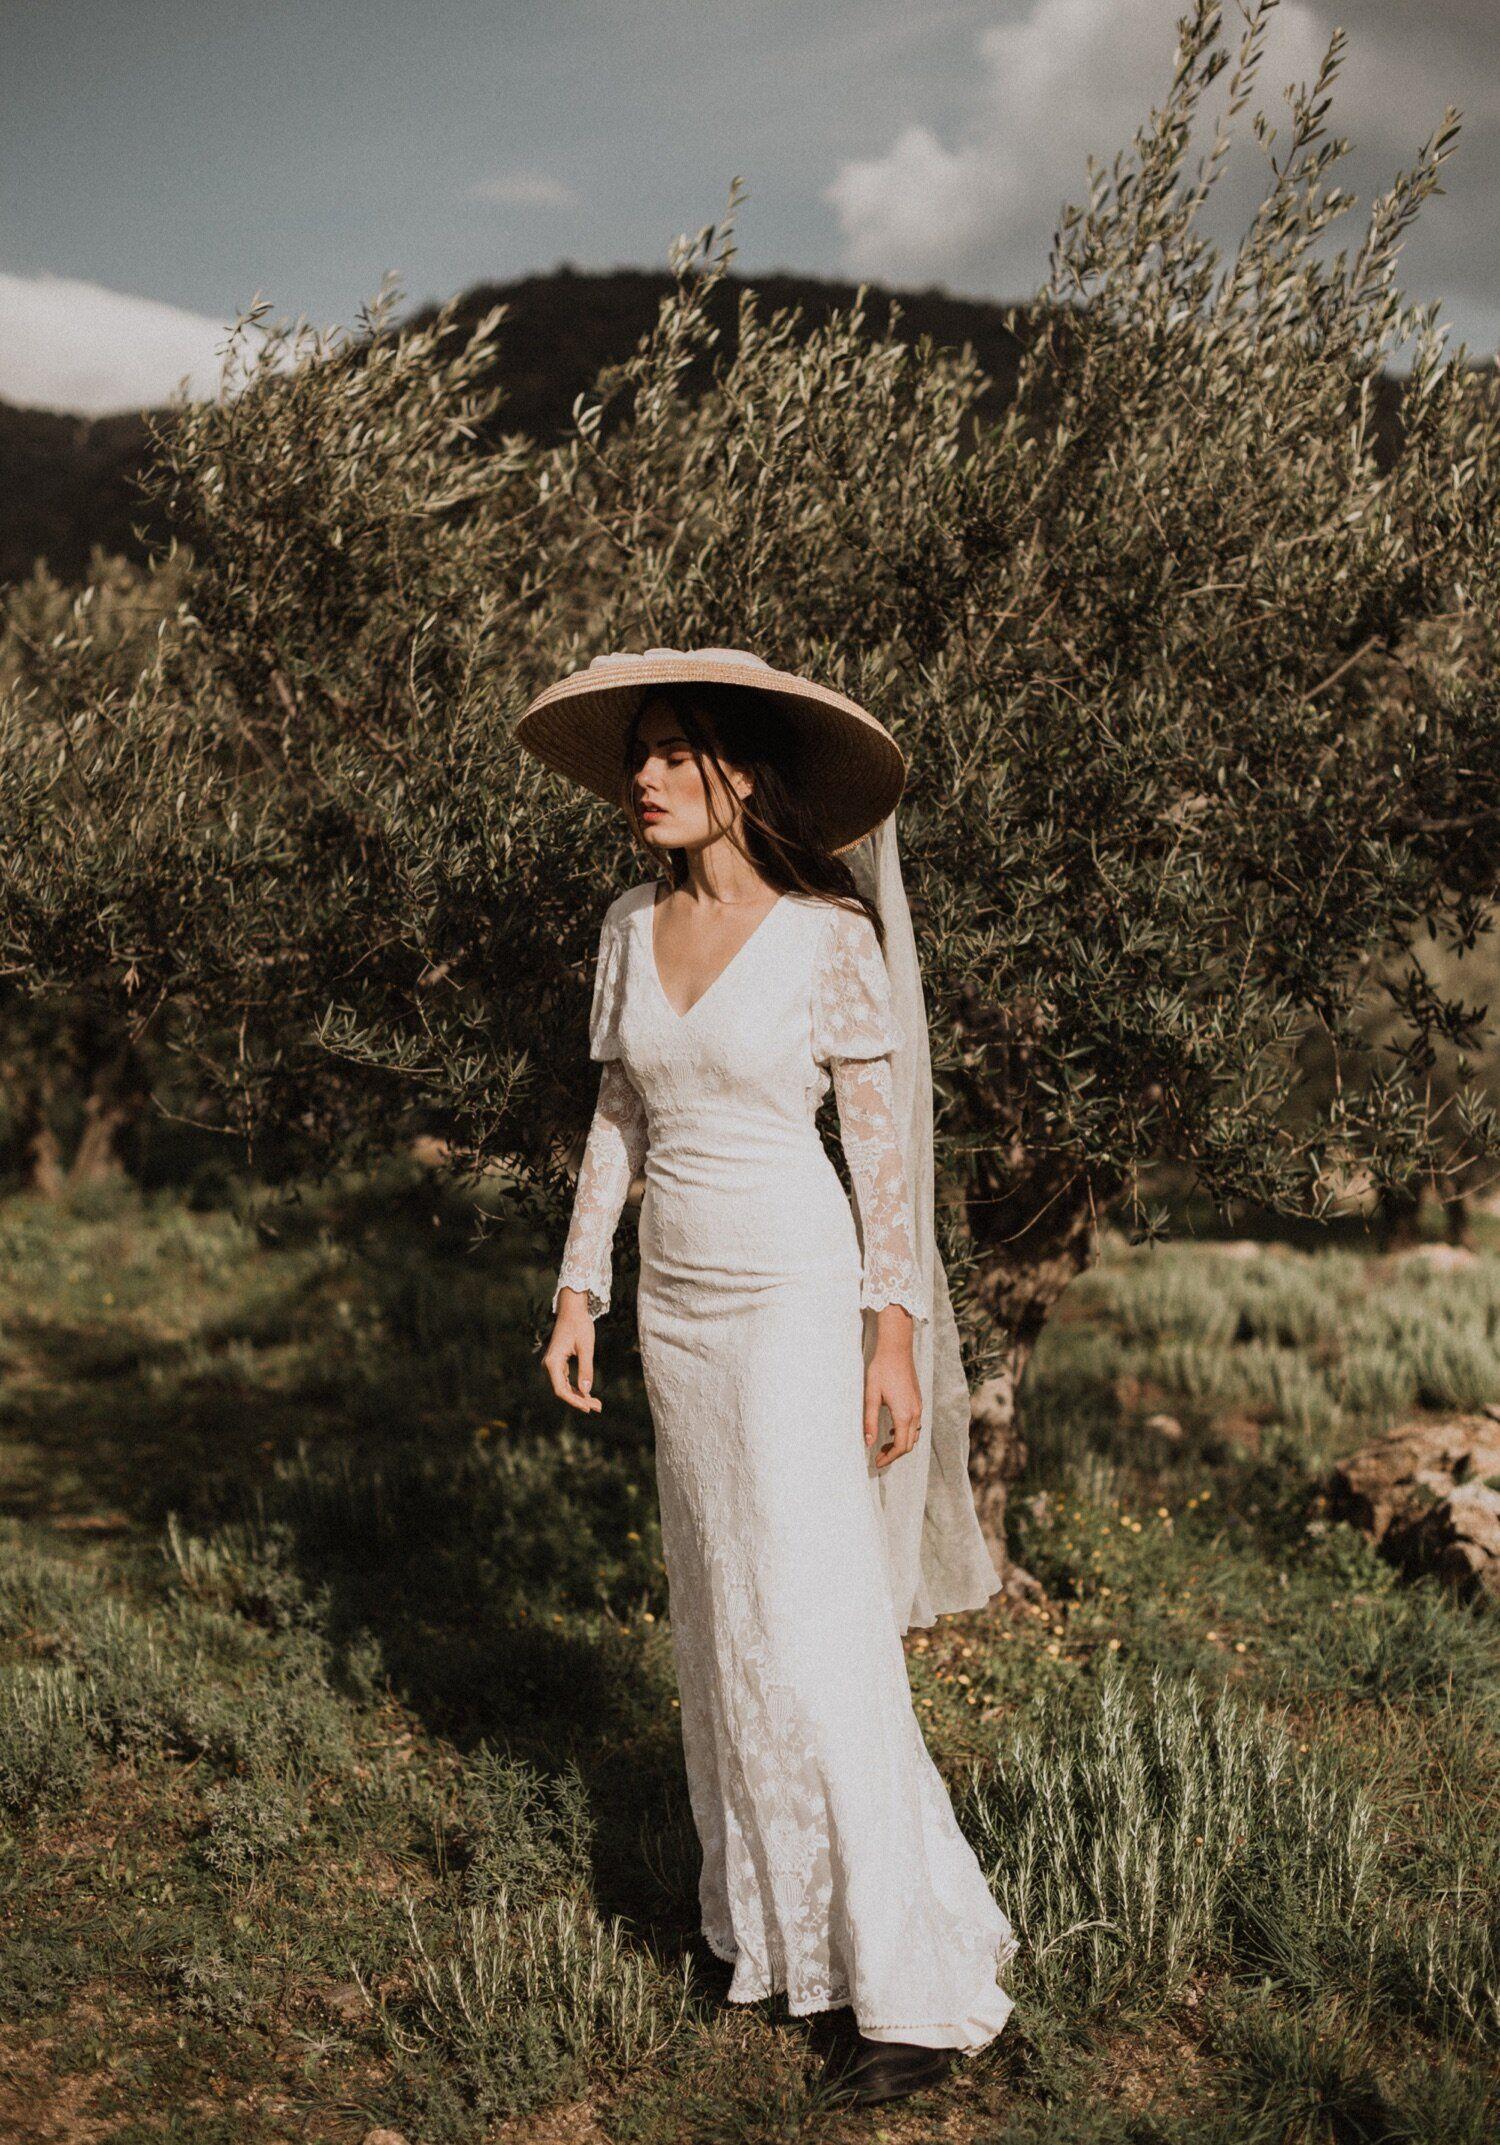 Pin On Barcelona And Europe Wedding Photographer